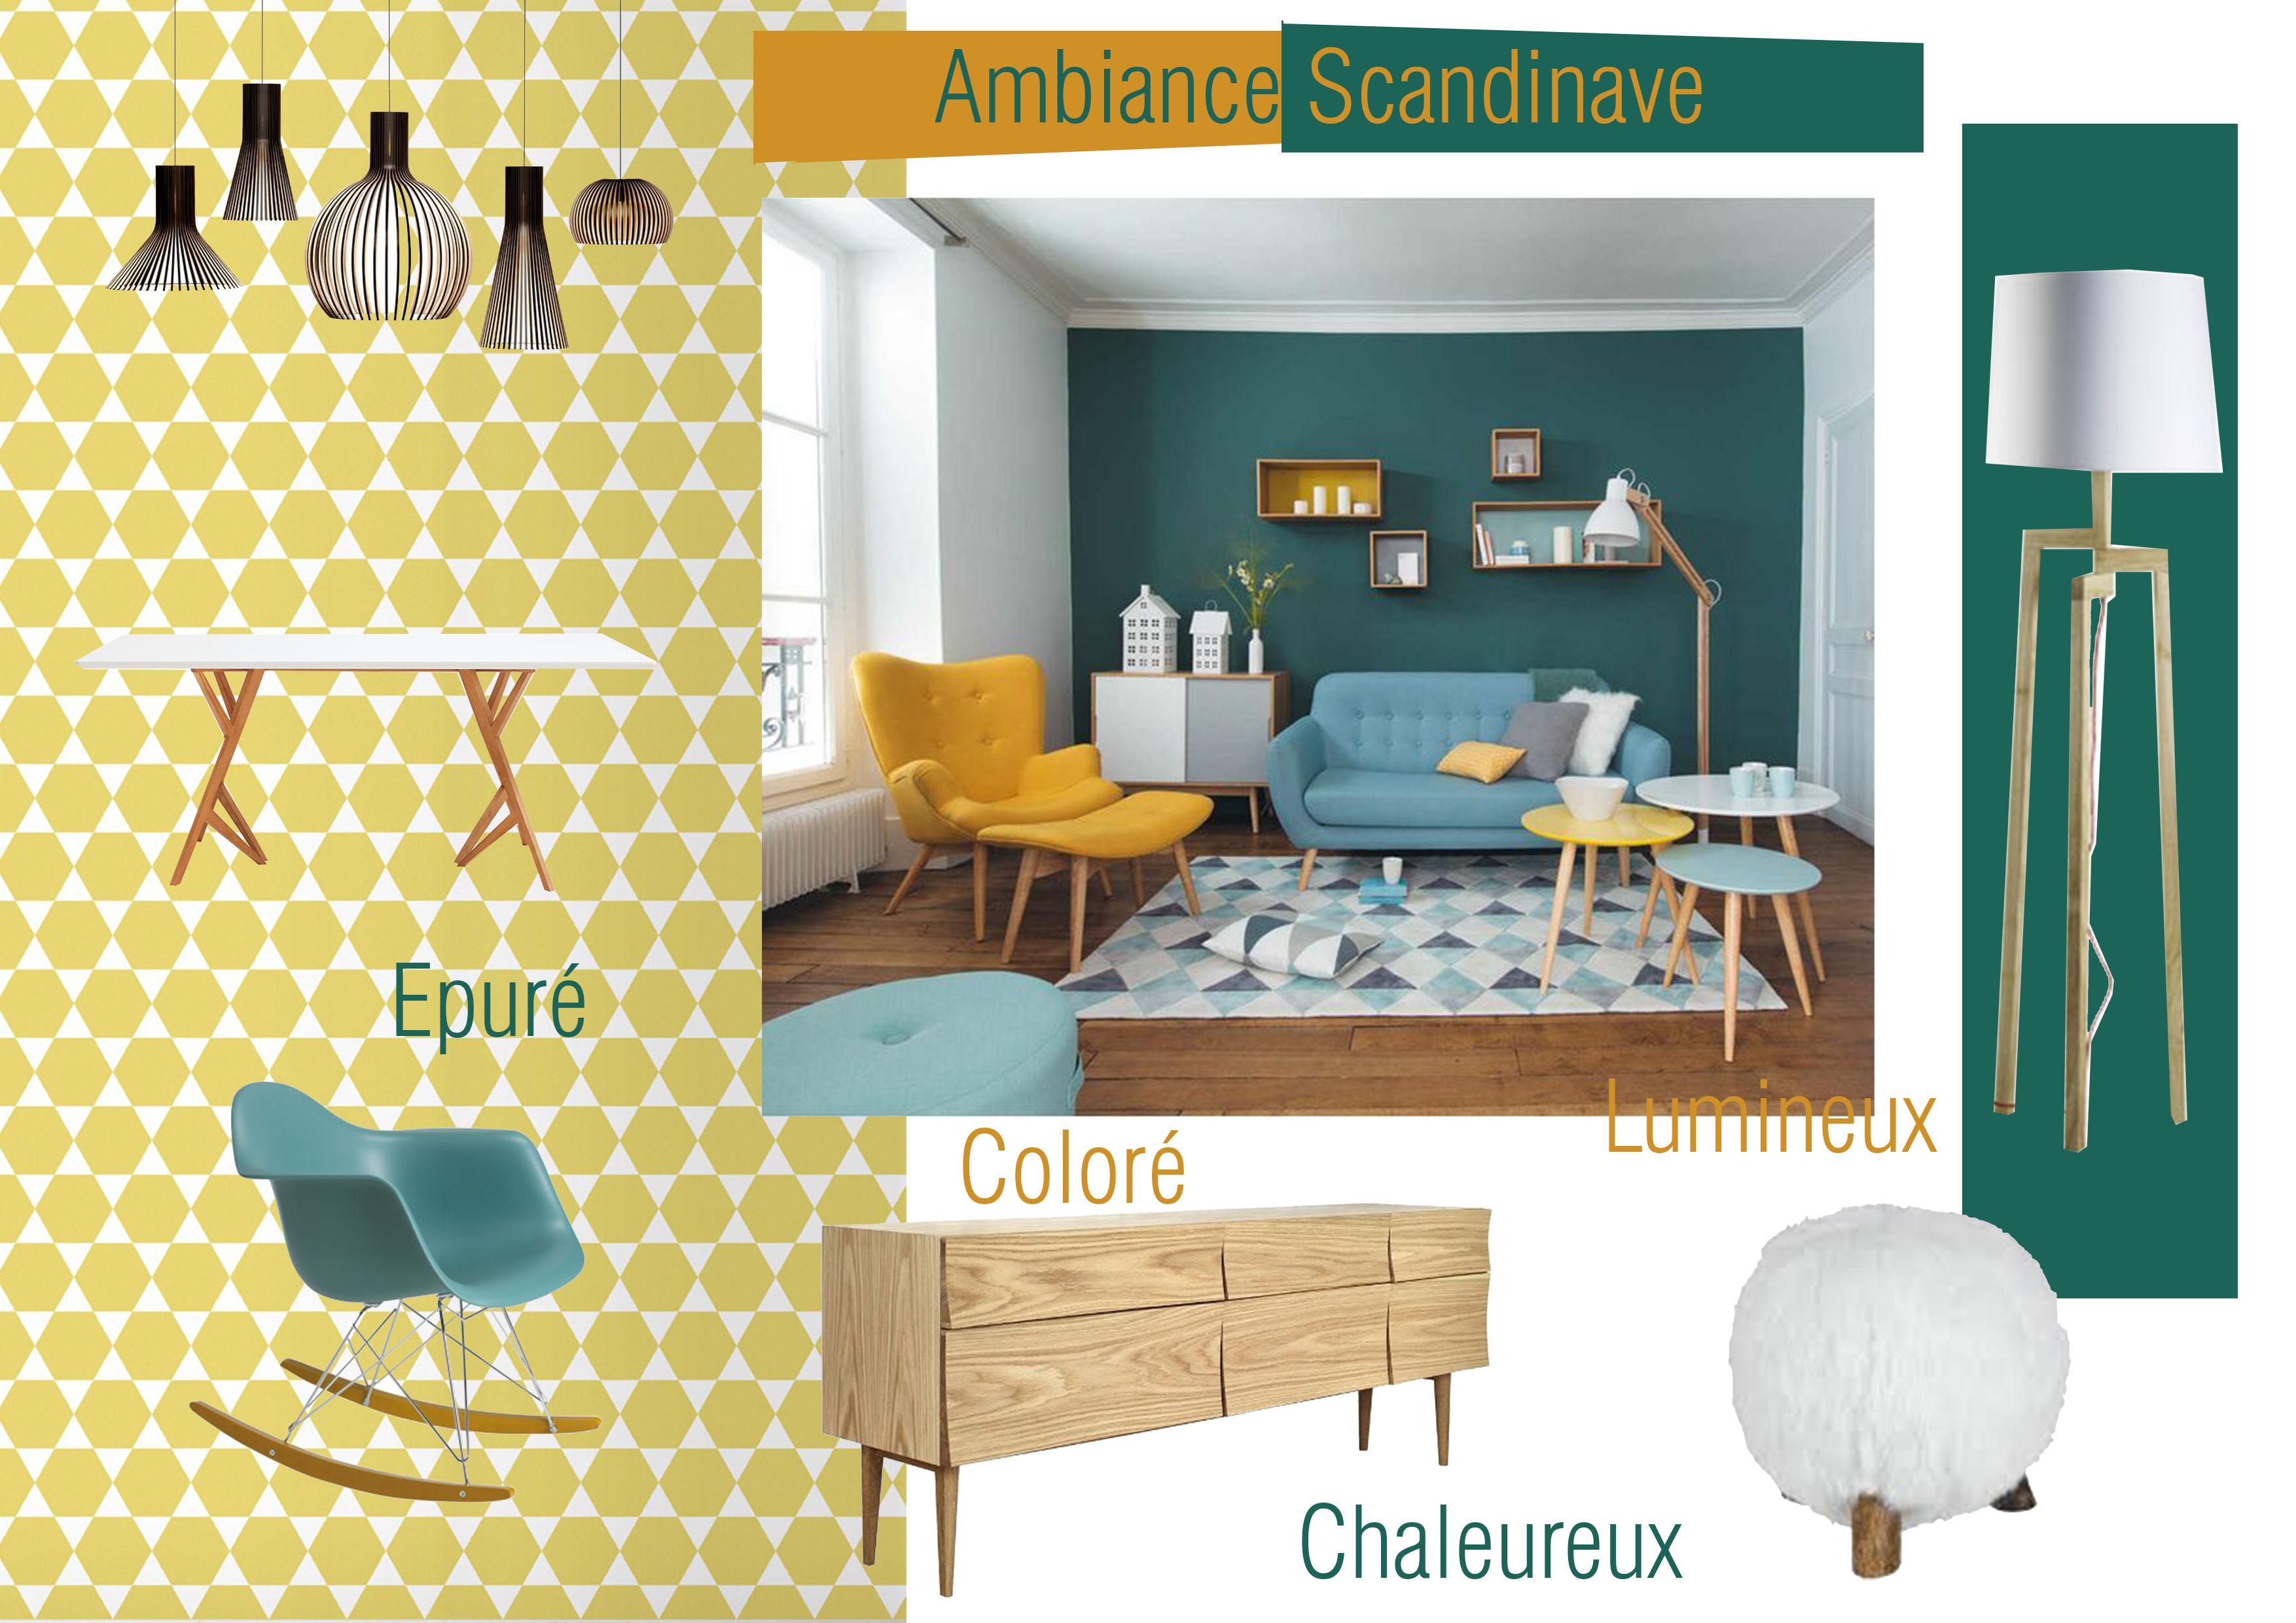 planche ambiance style scandinave sandra dangla. Black Bedroom Furniture Sets. Home Design Ideas